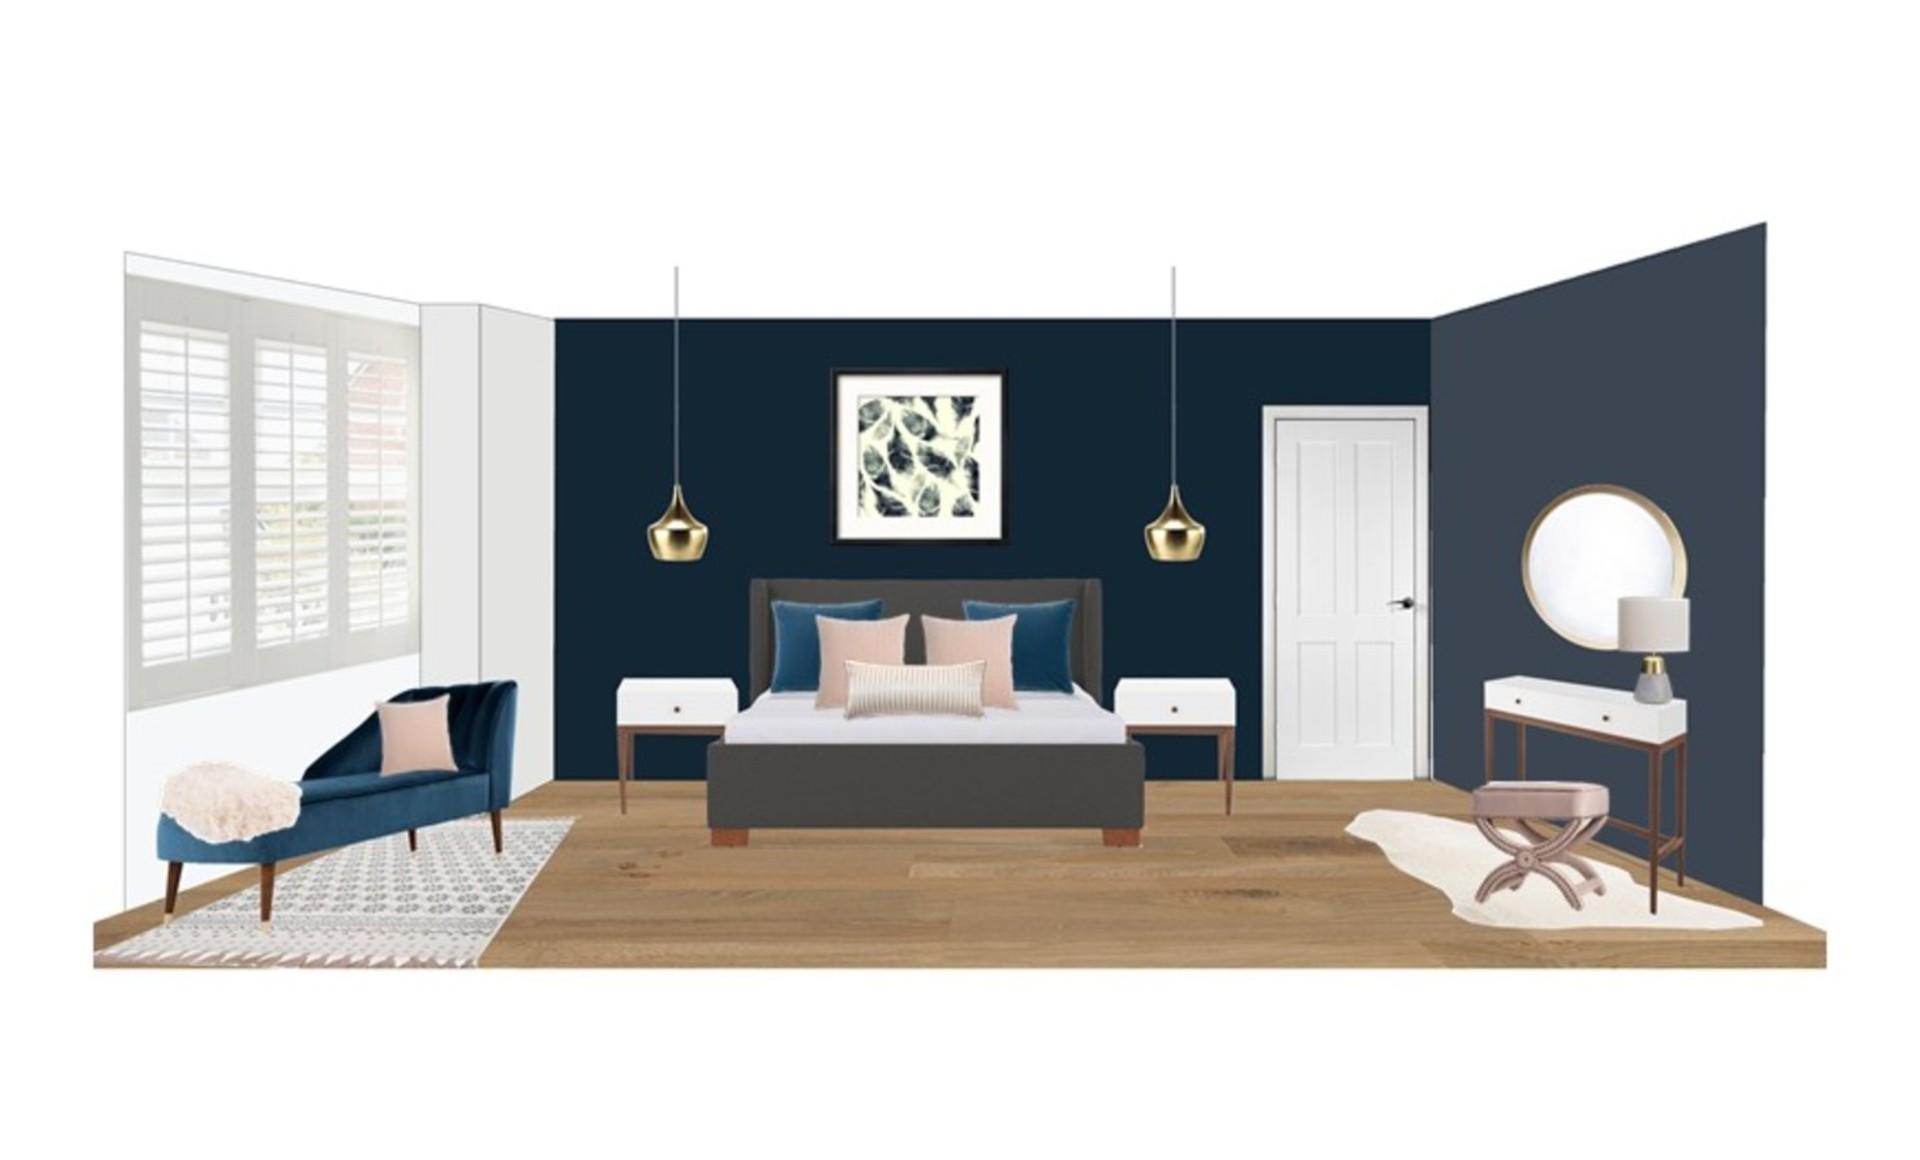 Milli master bedroom 2d